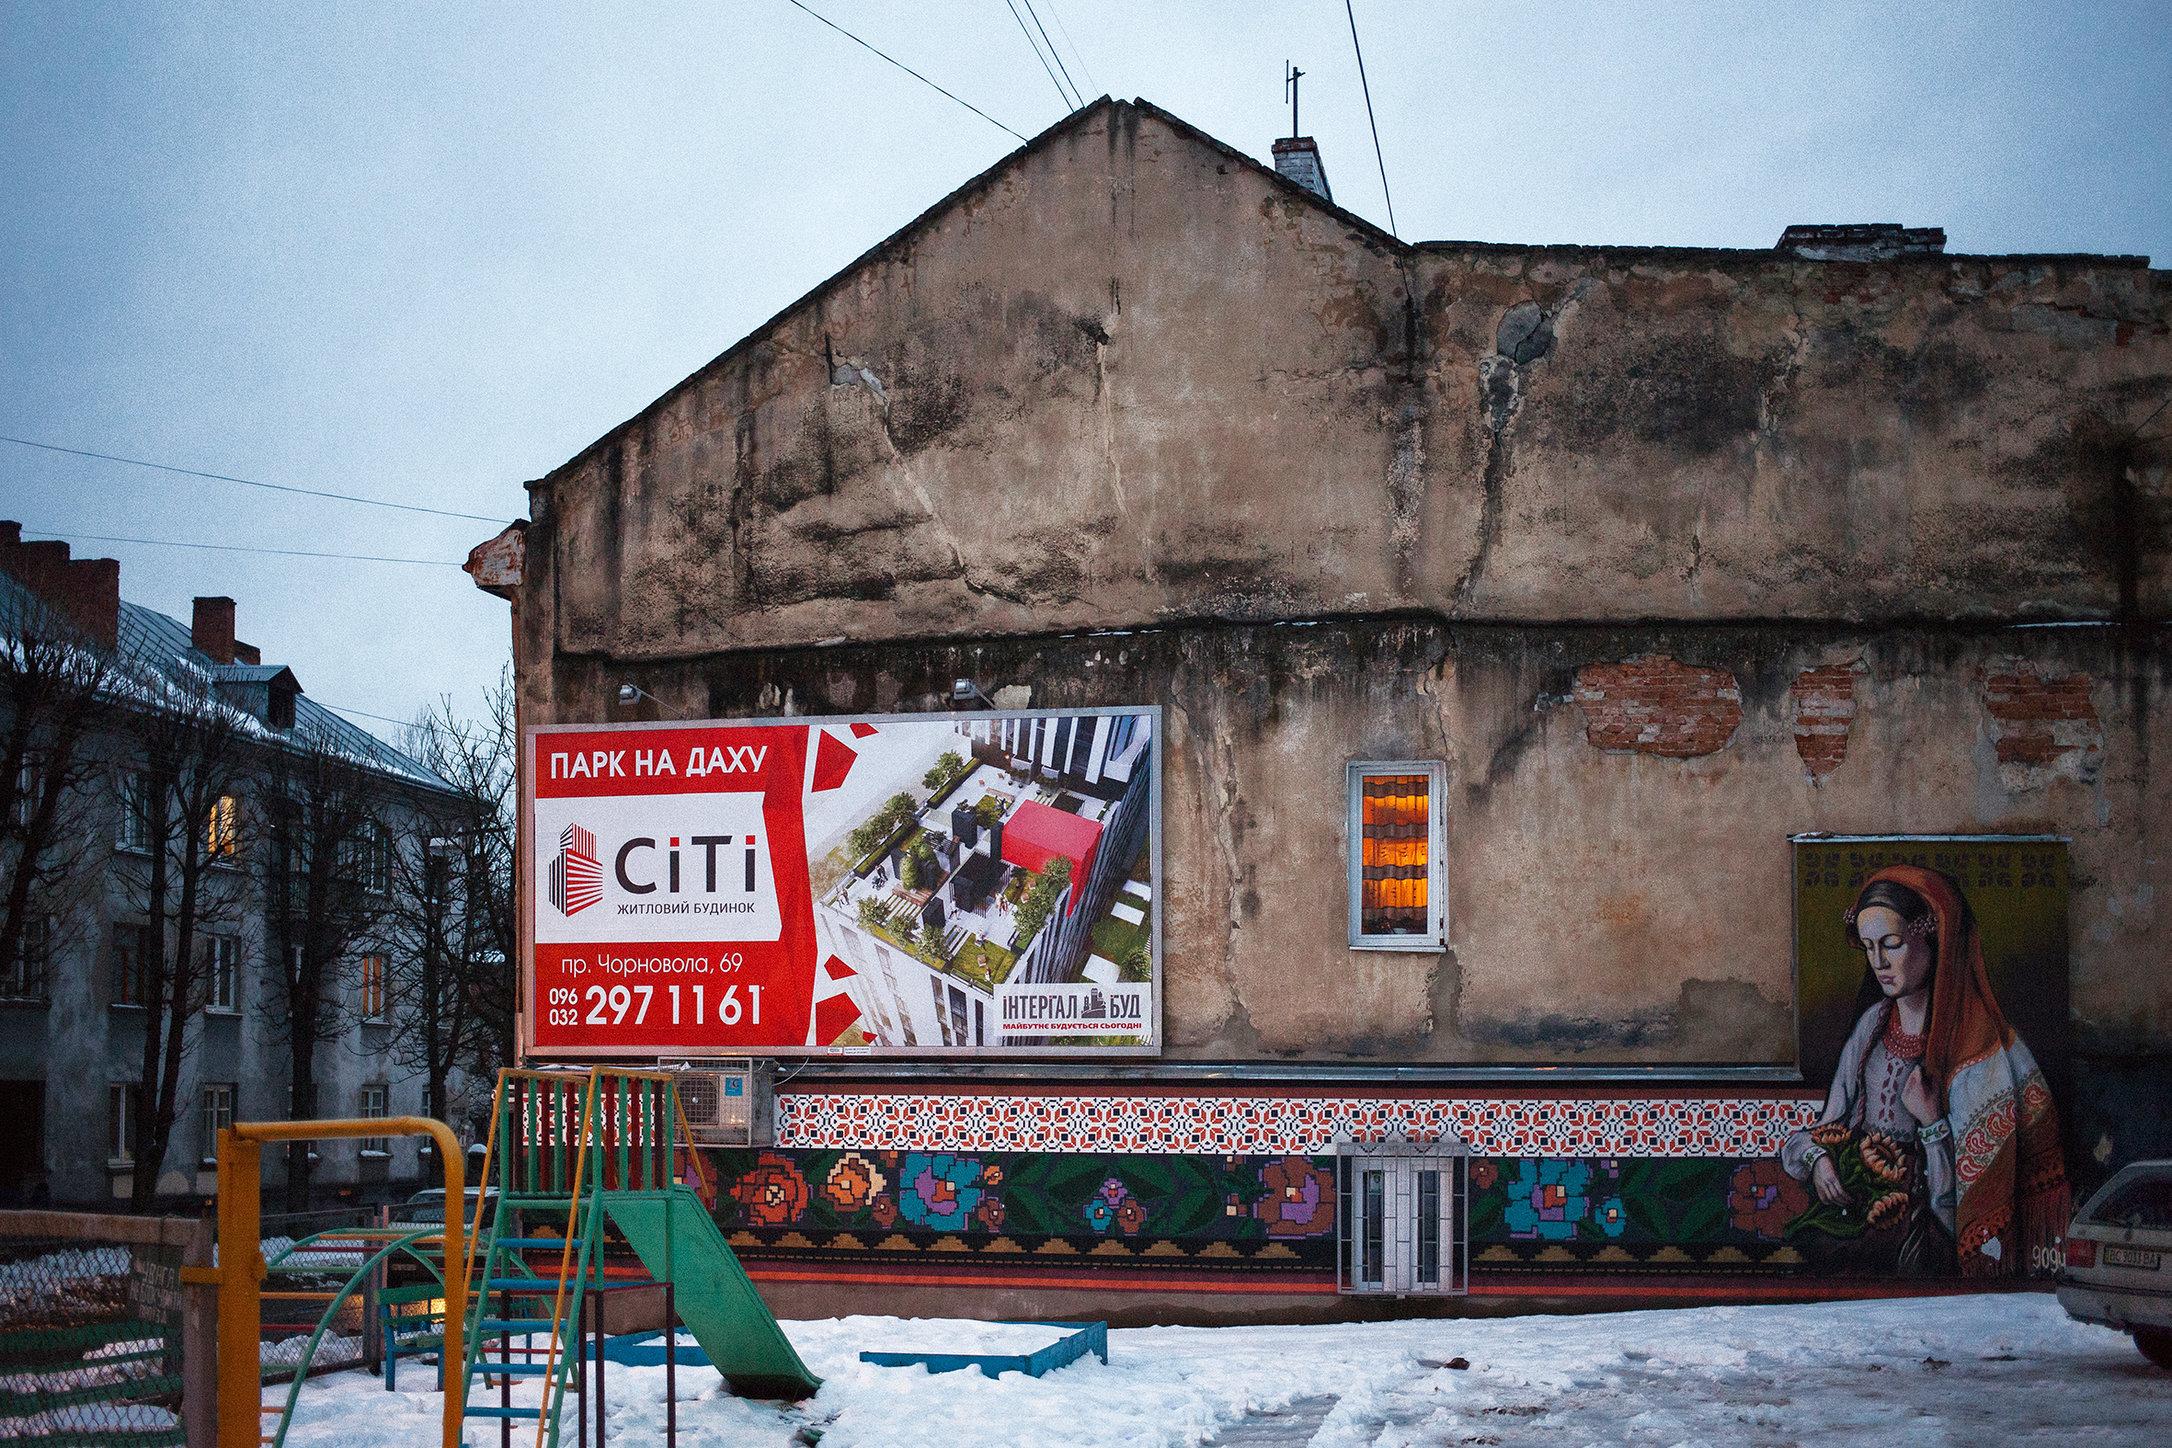 Lviv, Ukraine, 2016